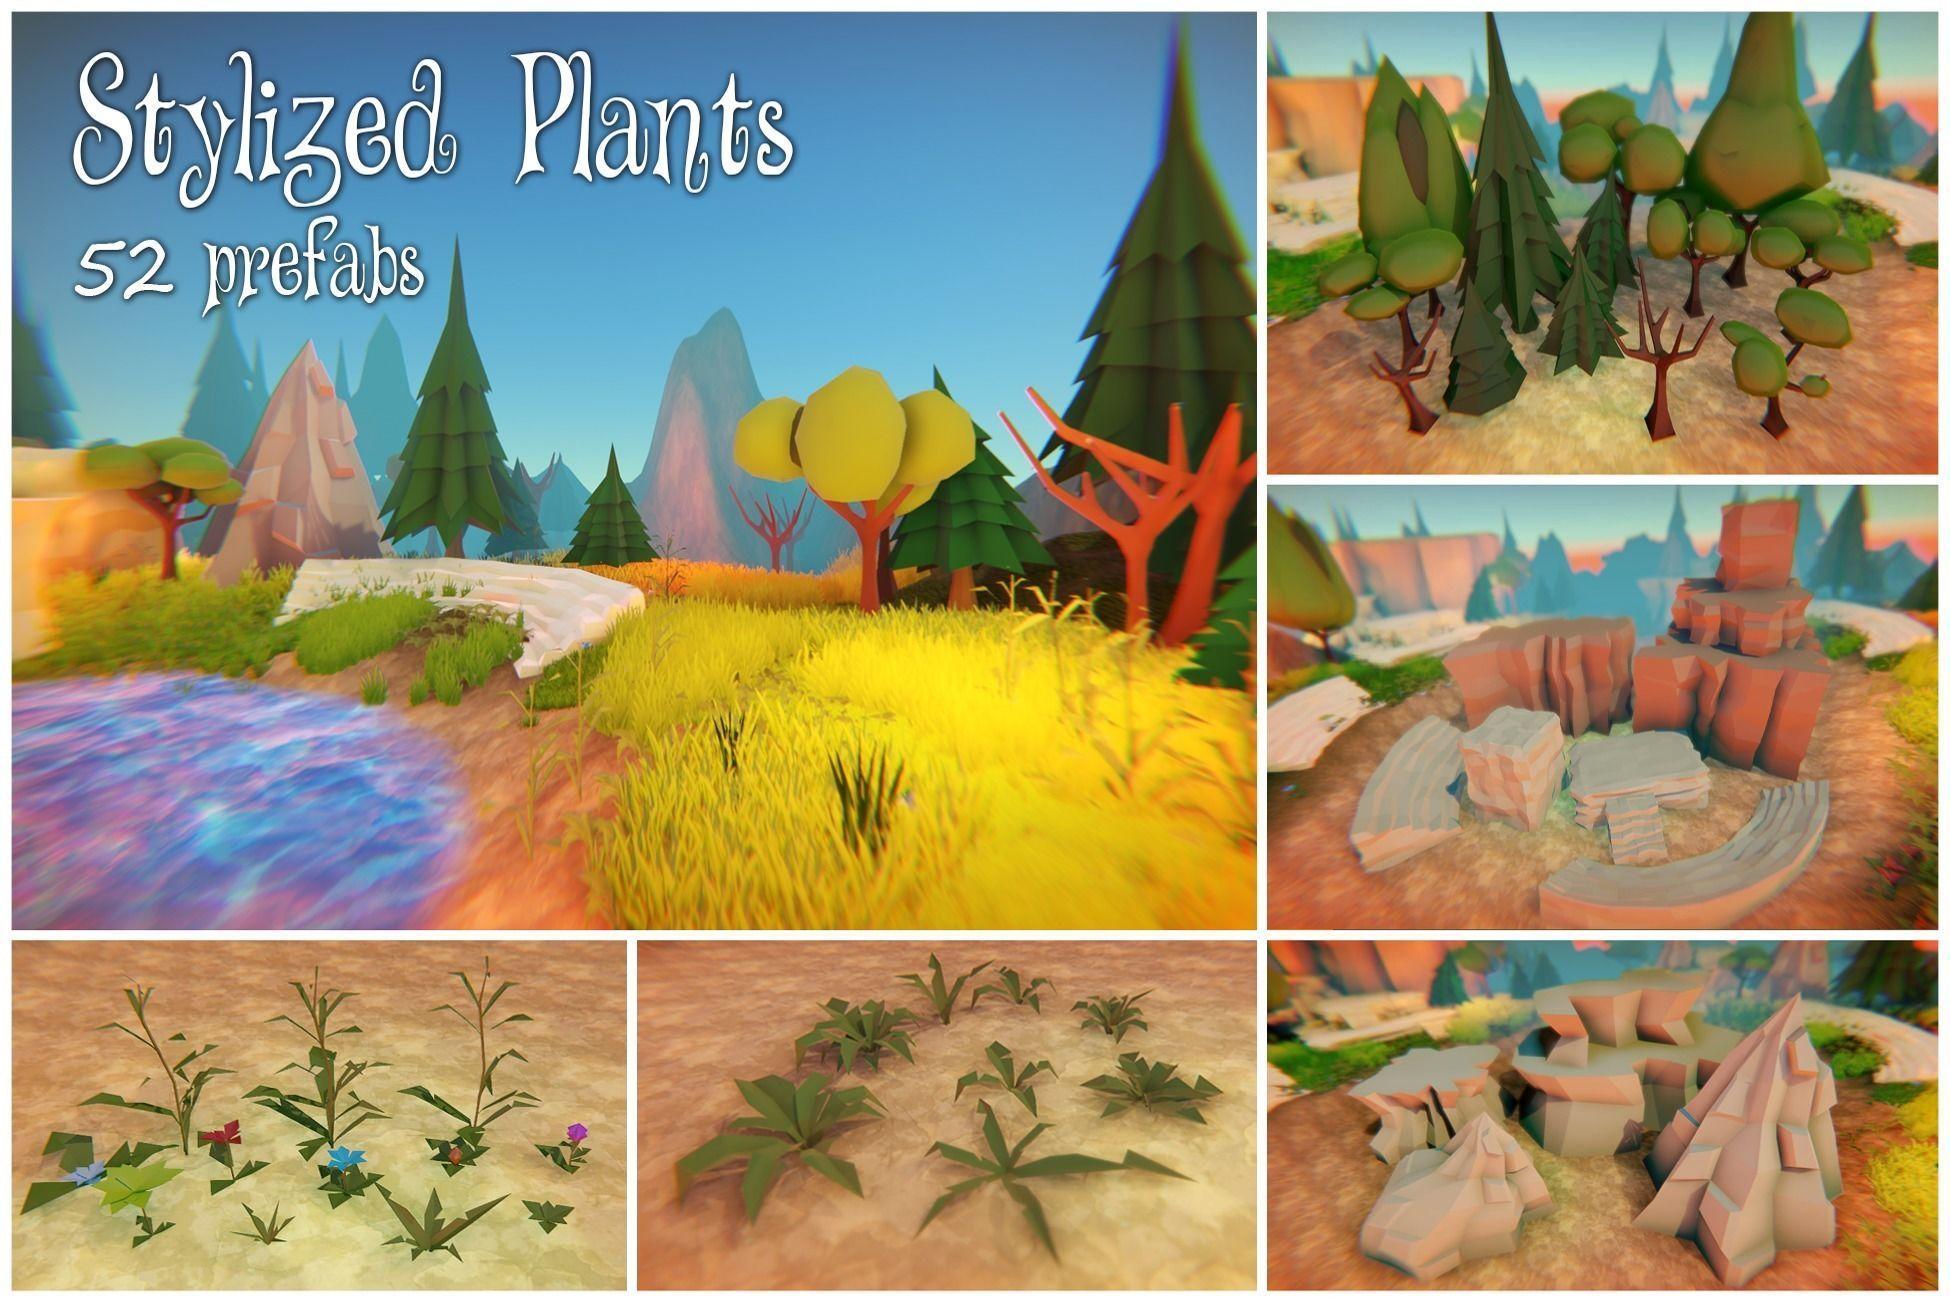 Stylized Plants